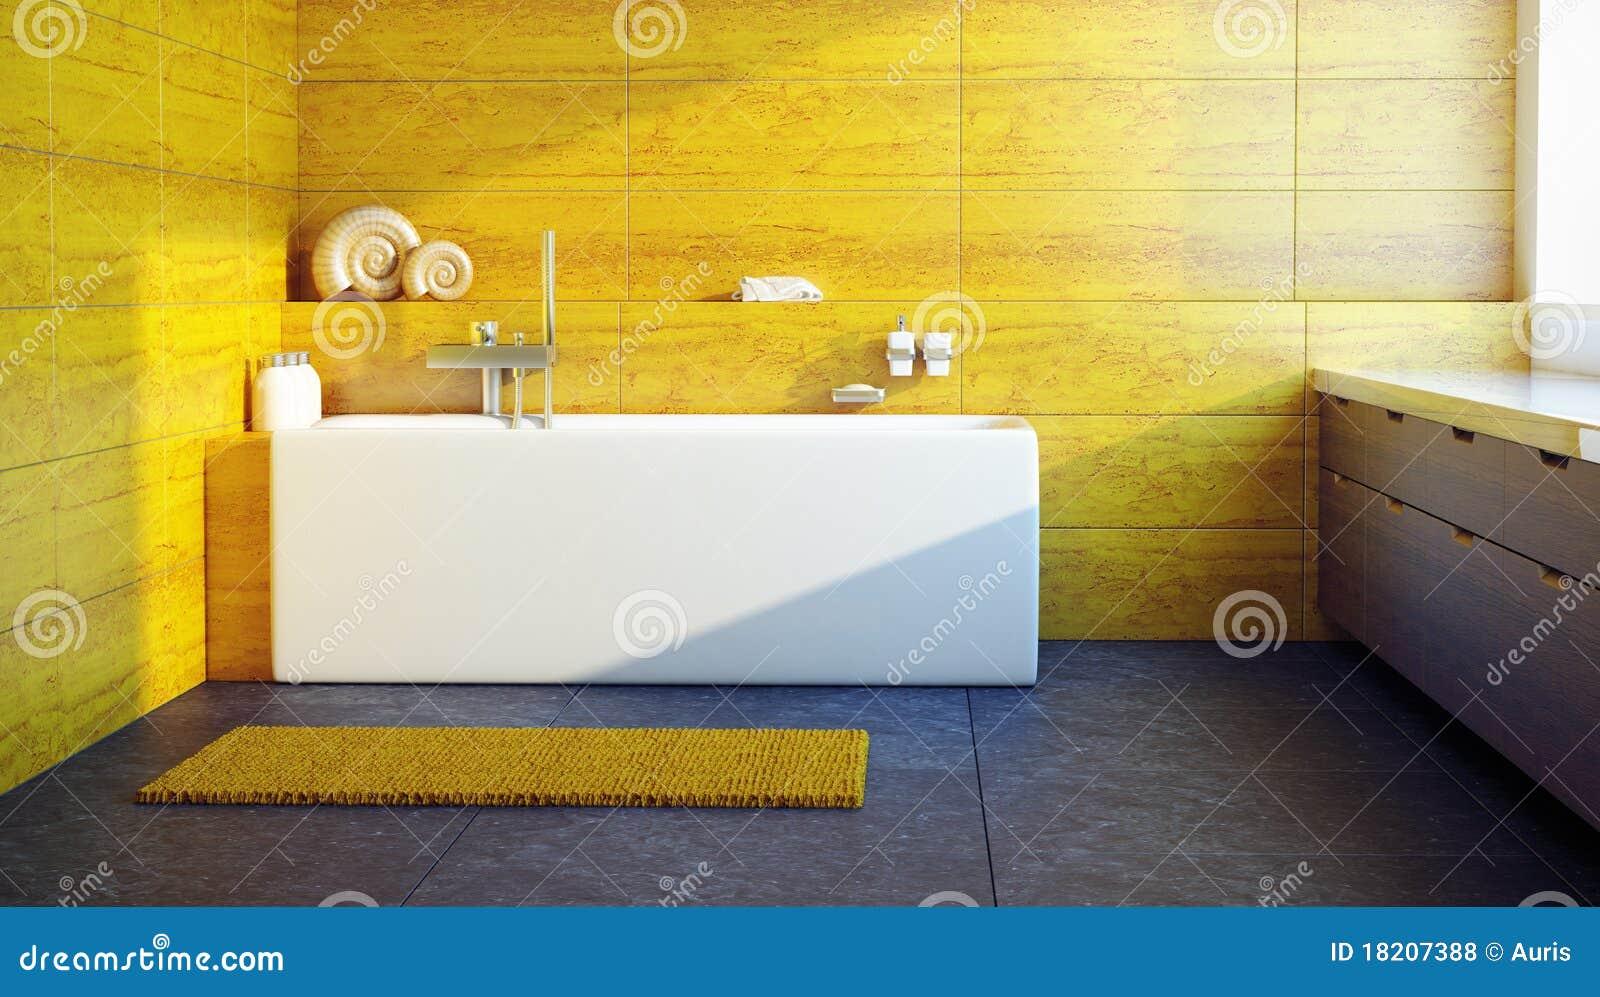 Modern Interior Design Of A Bathroom Royalty Free Stock Photos Image 18207388